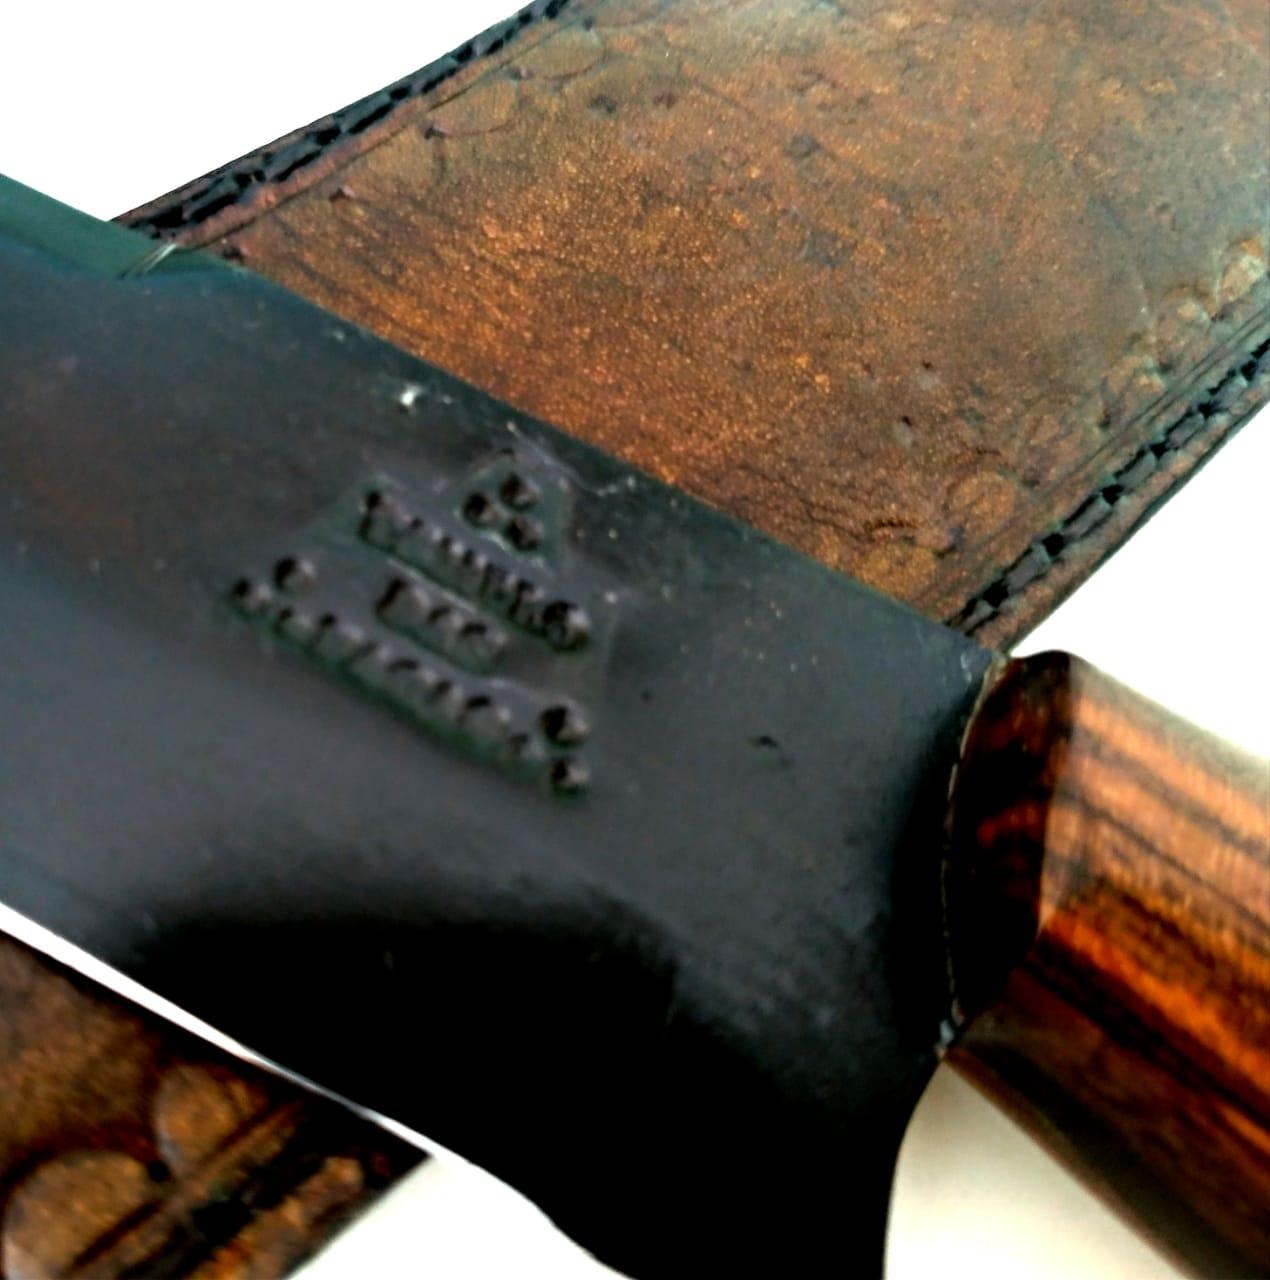 Faca artesanal full tang estilo sorocabana 12 polegadas